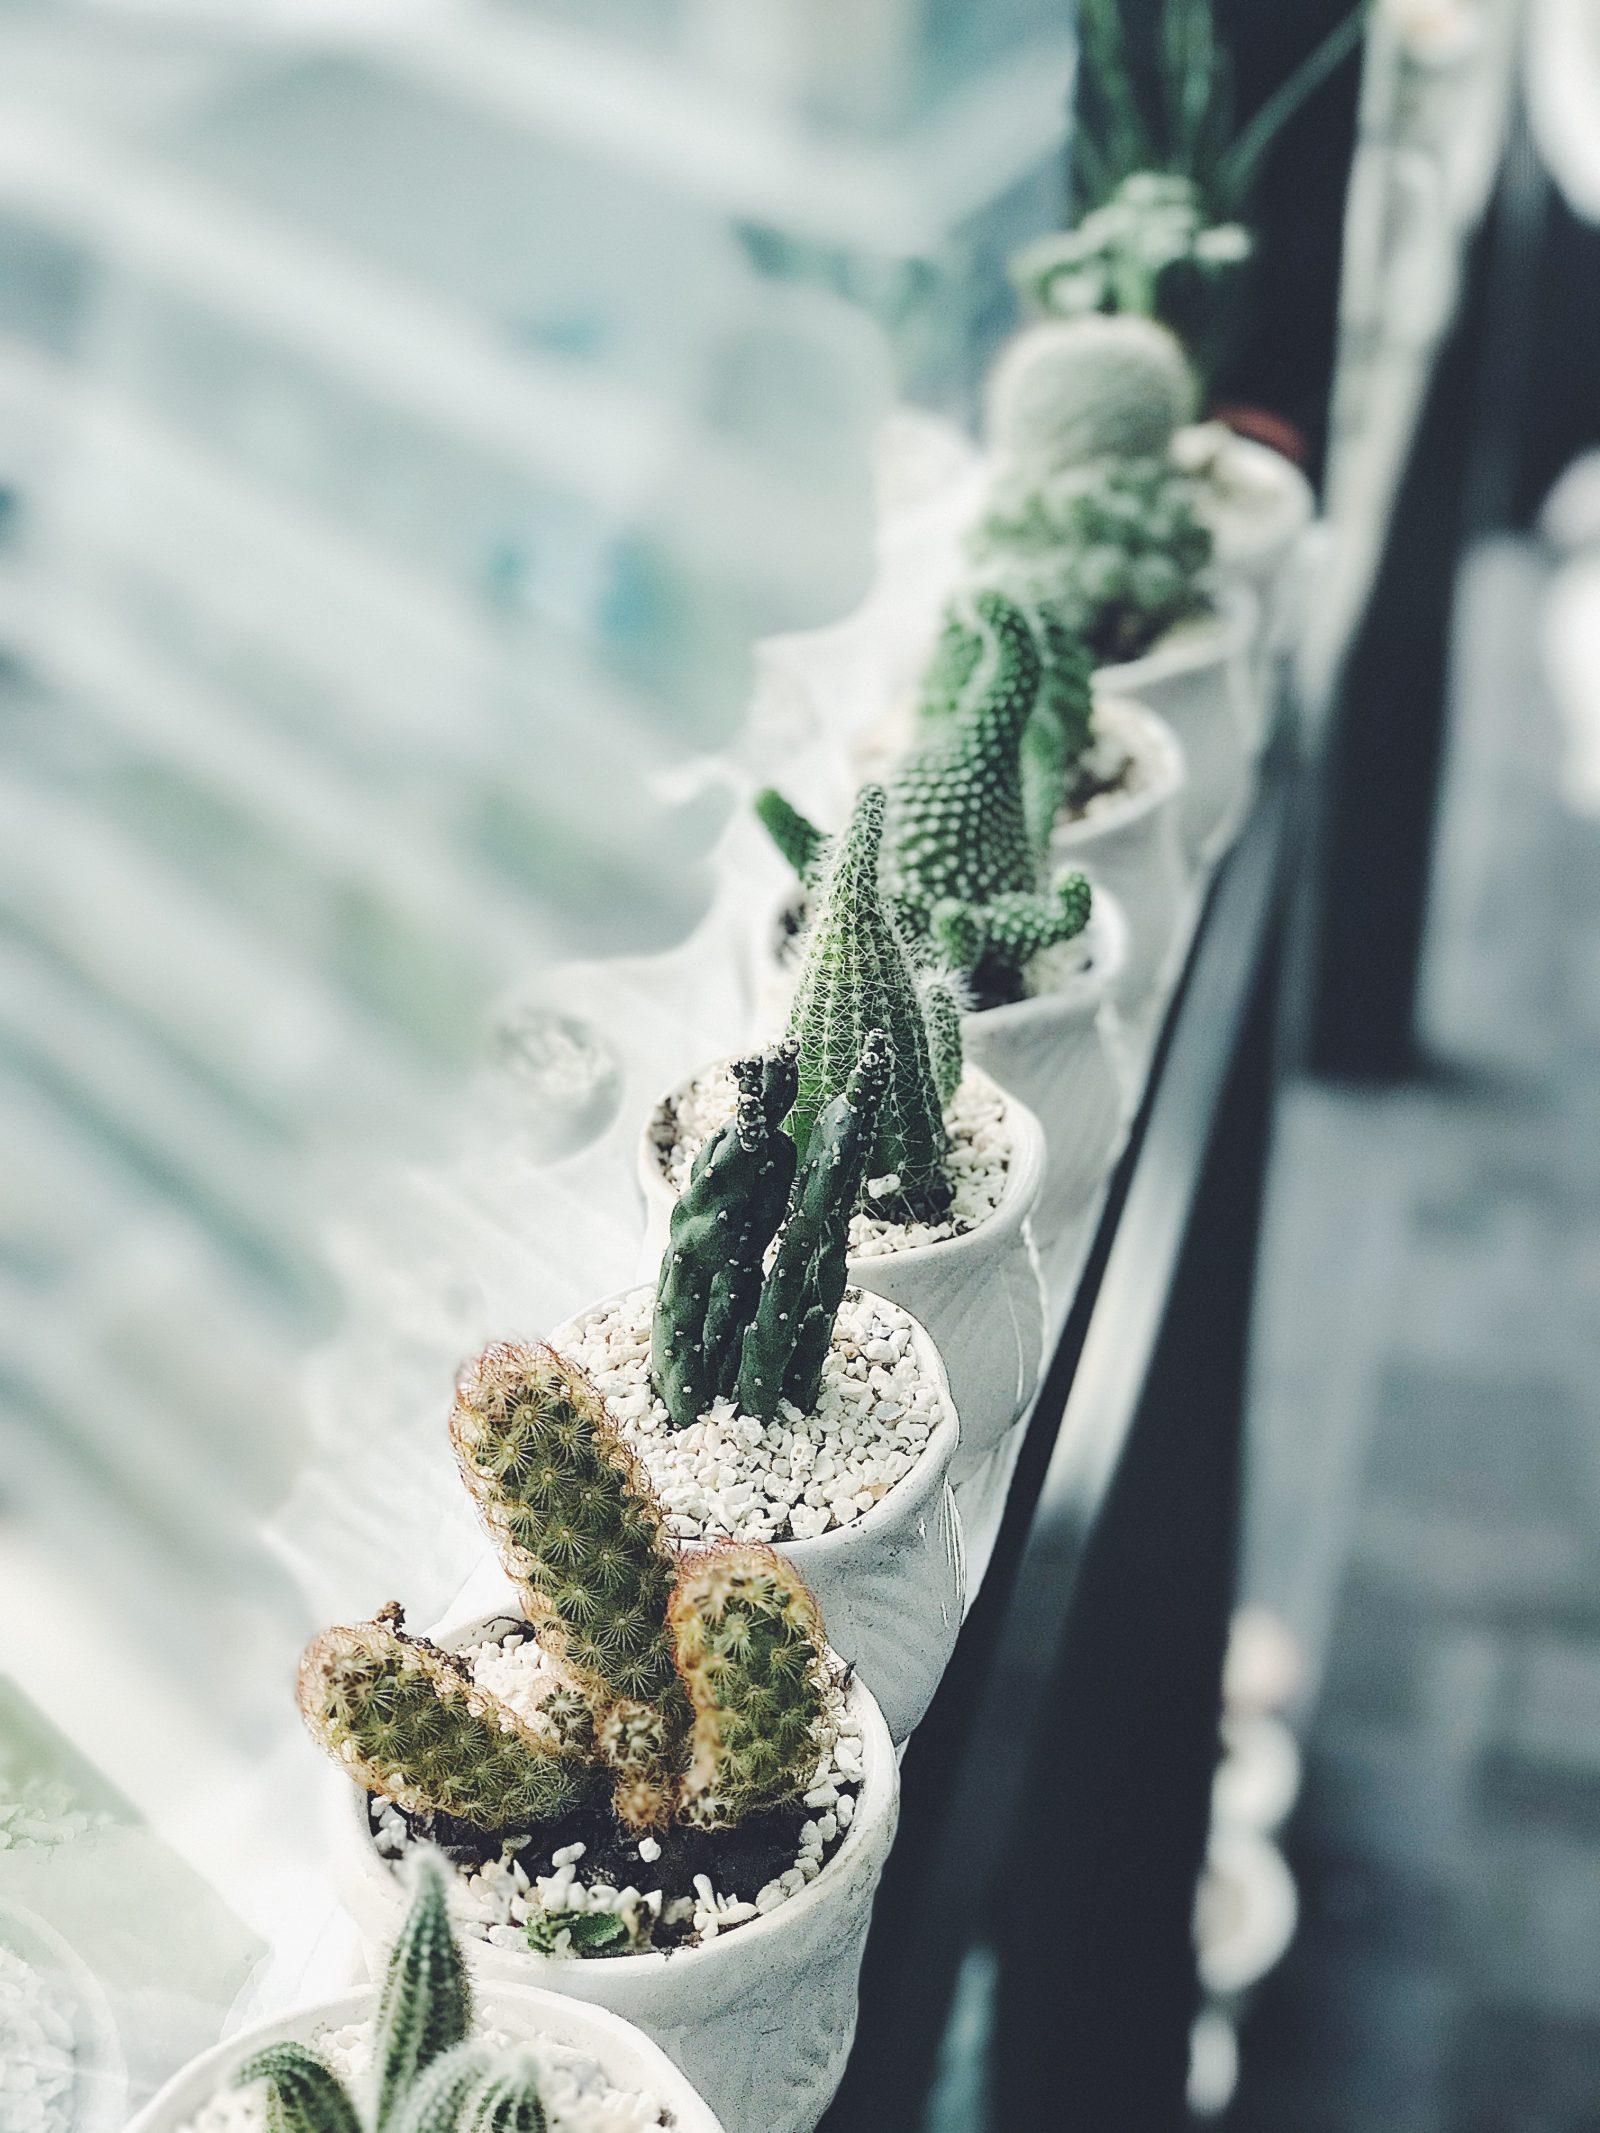 planten in je interieur - kamerplant ideeën cactus